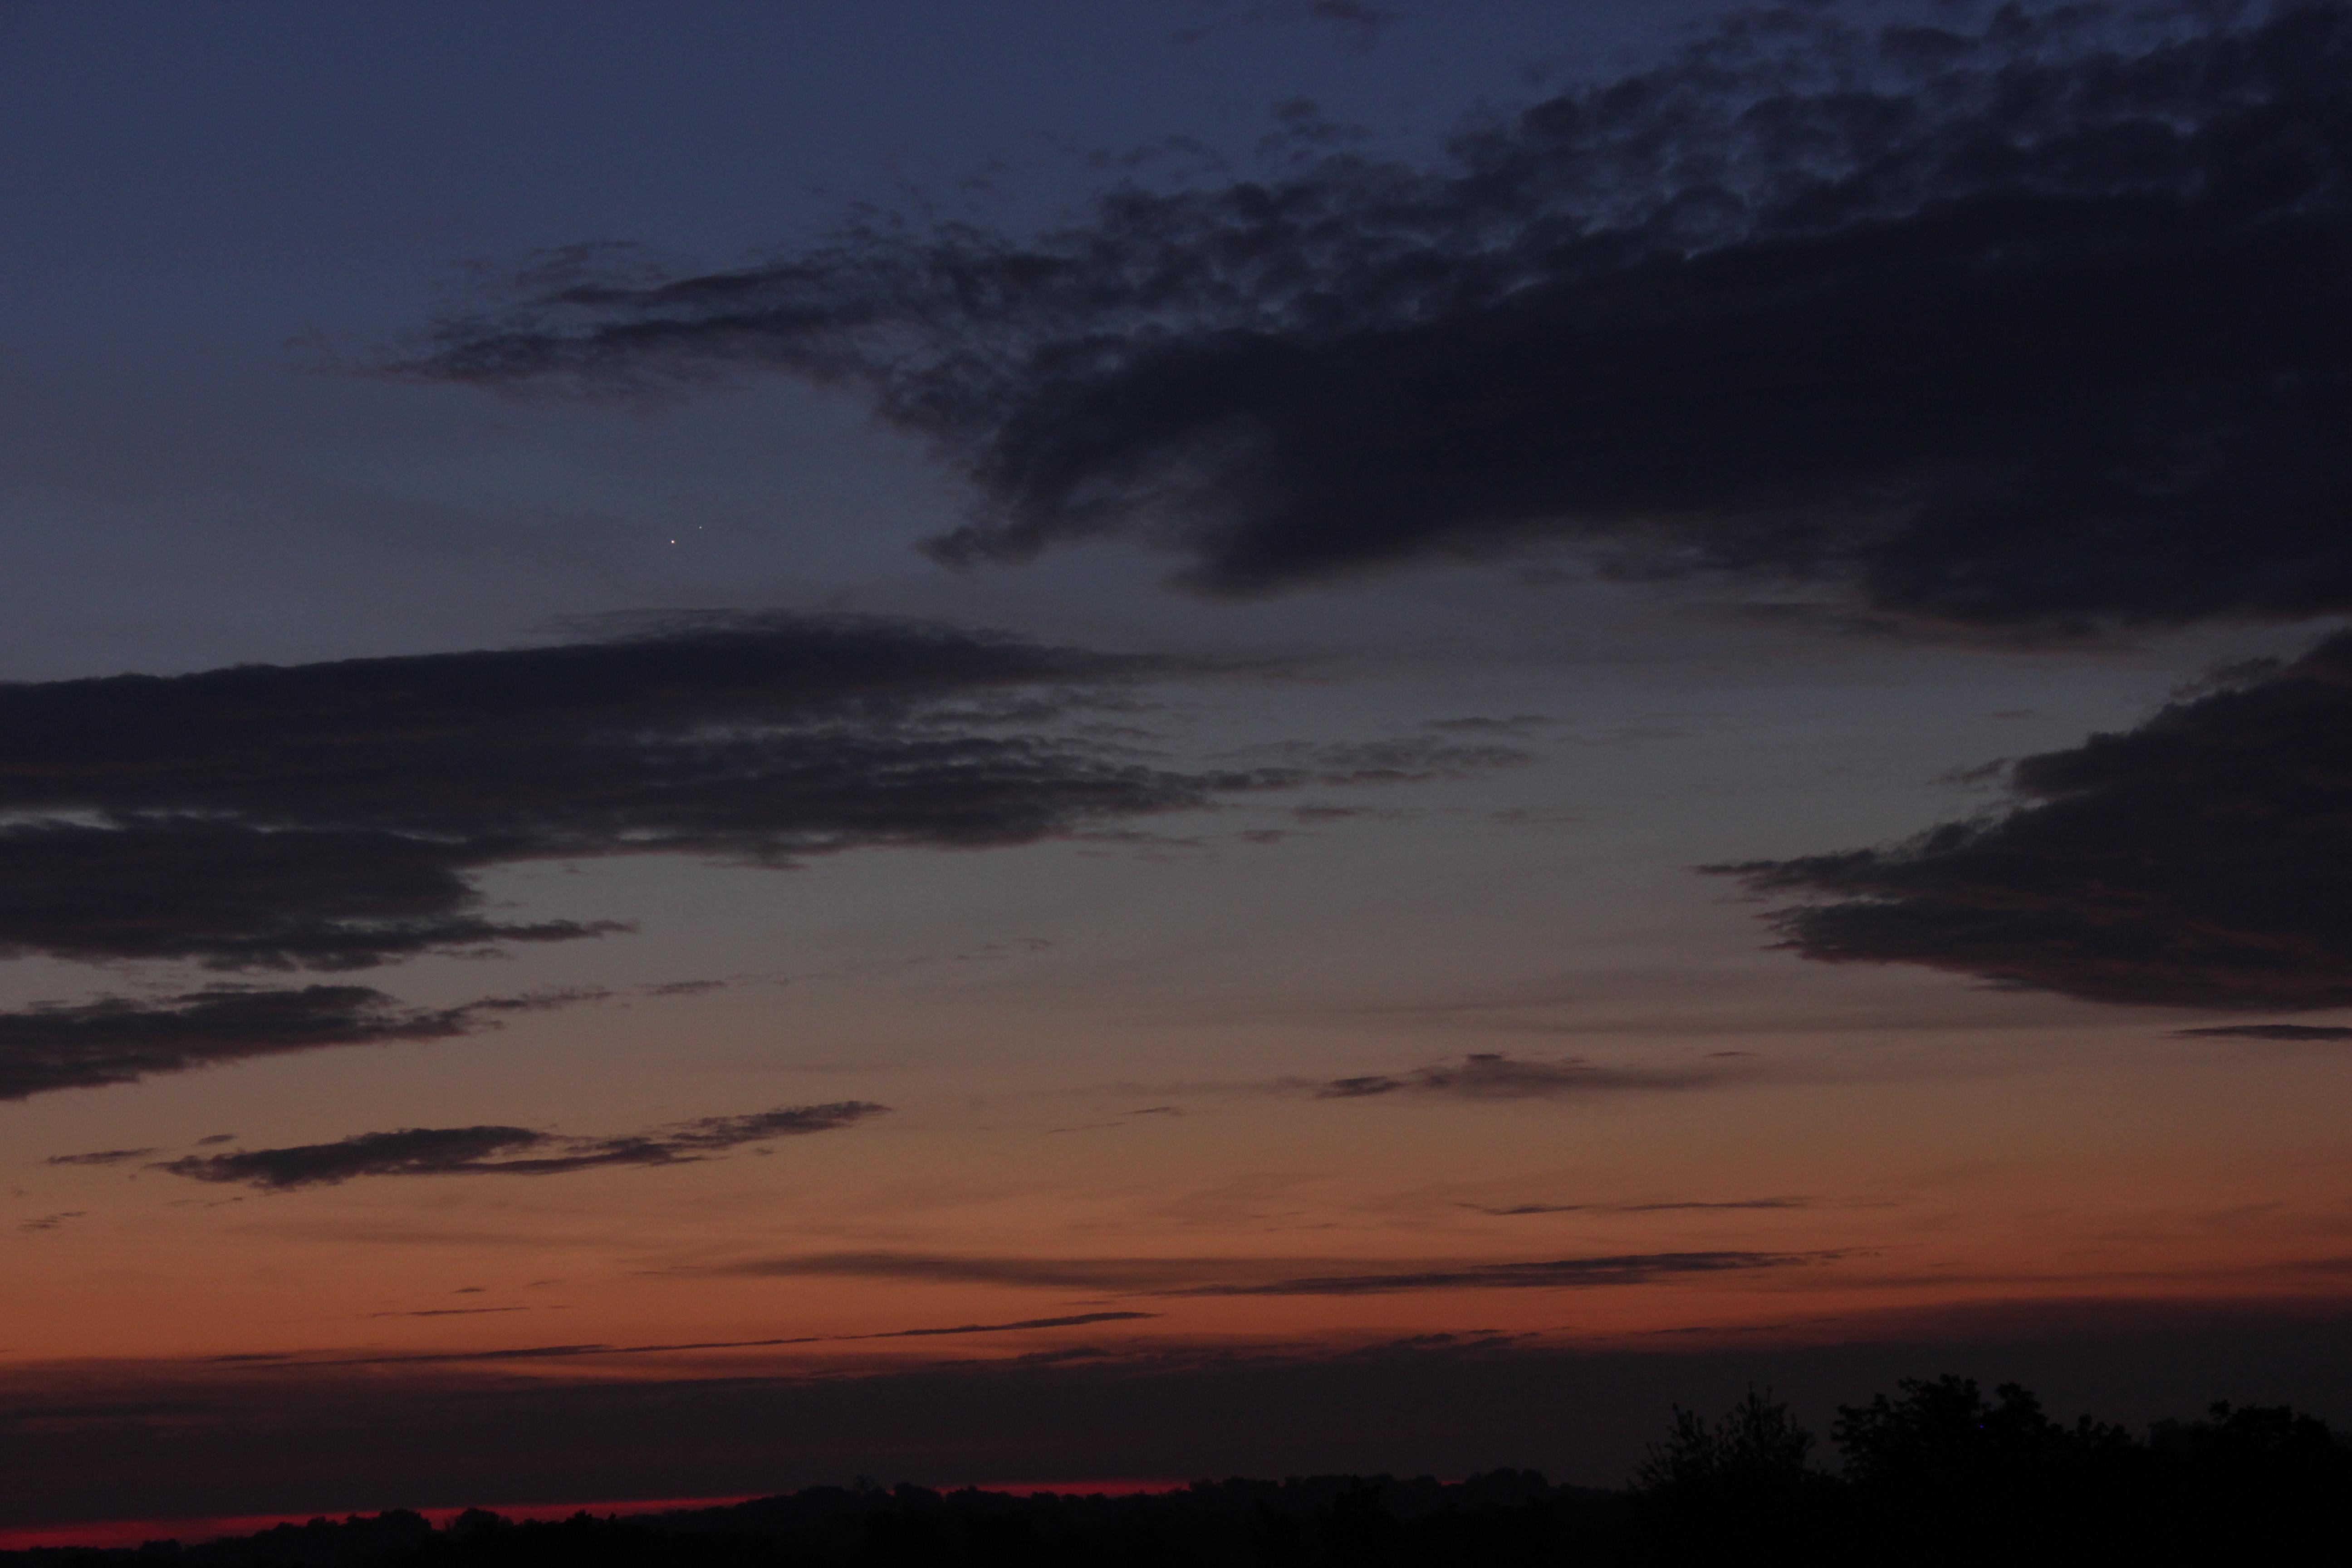 Not so closeup of Venus and Jupiter through clouds and brightening skies (photo credit: Dan Andrea)